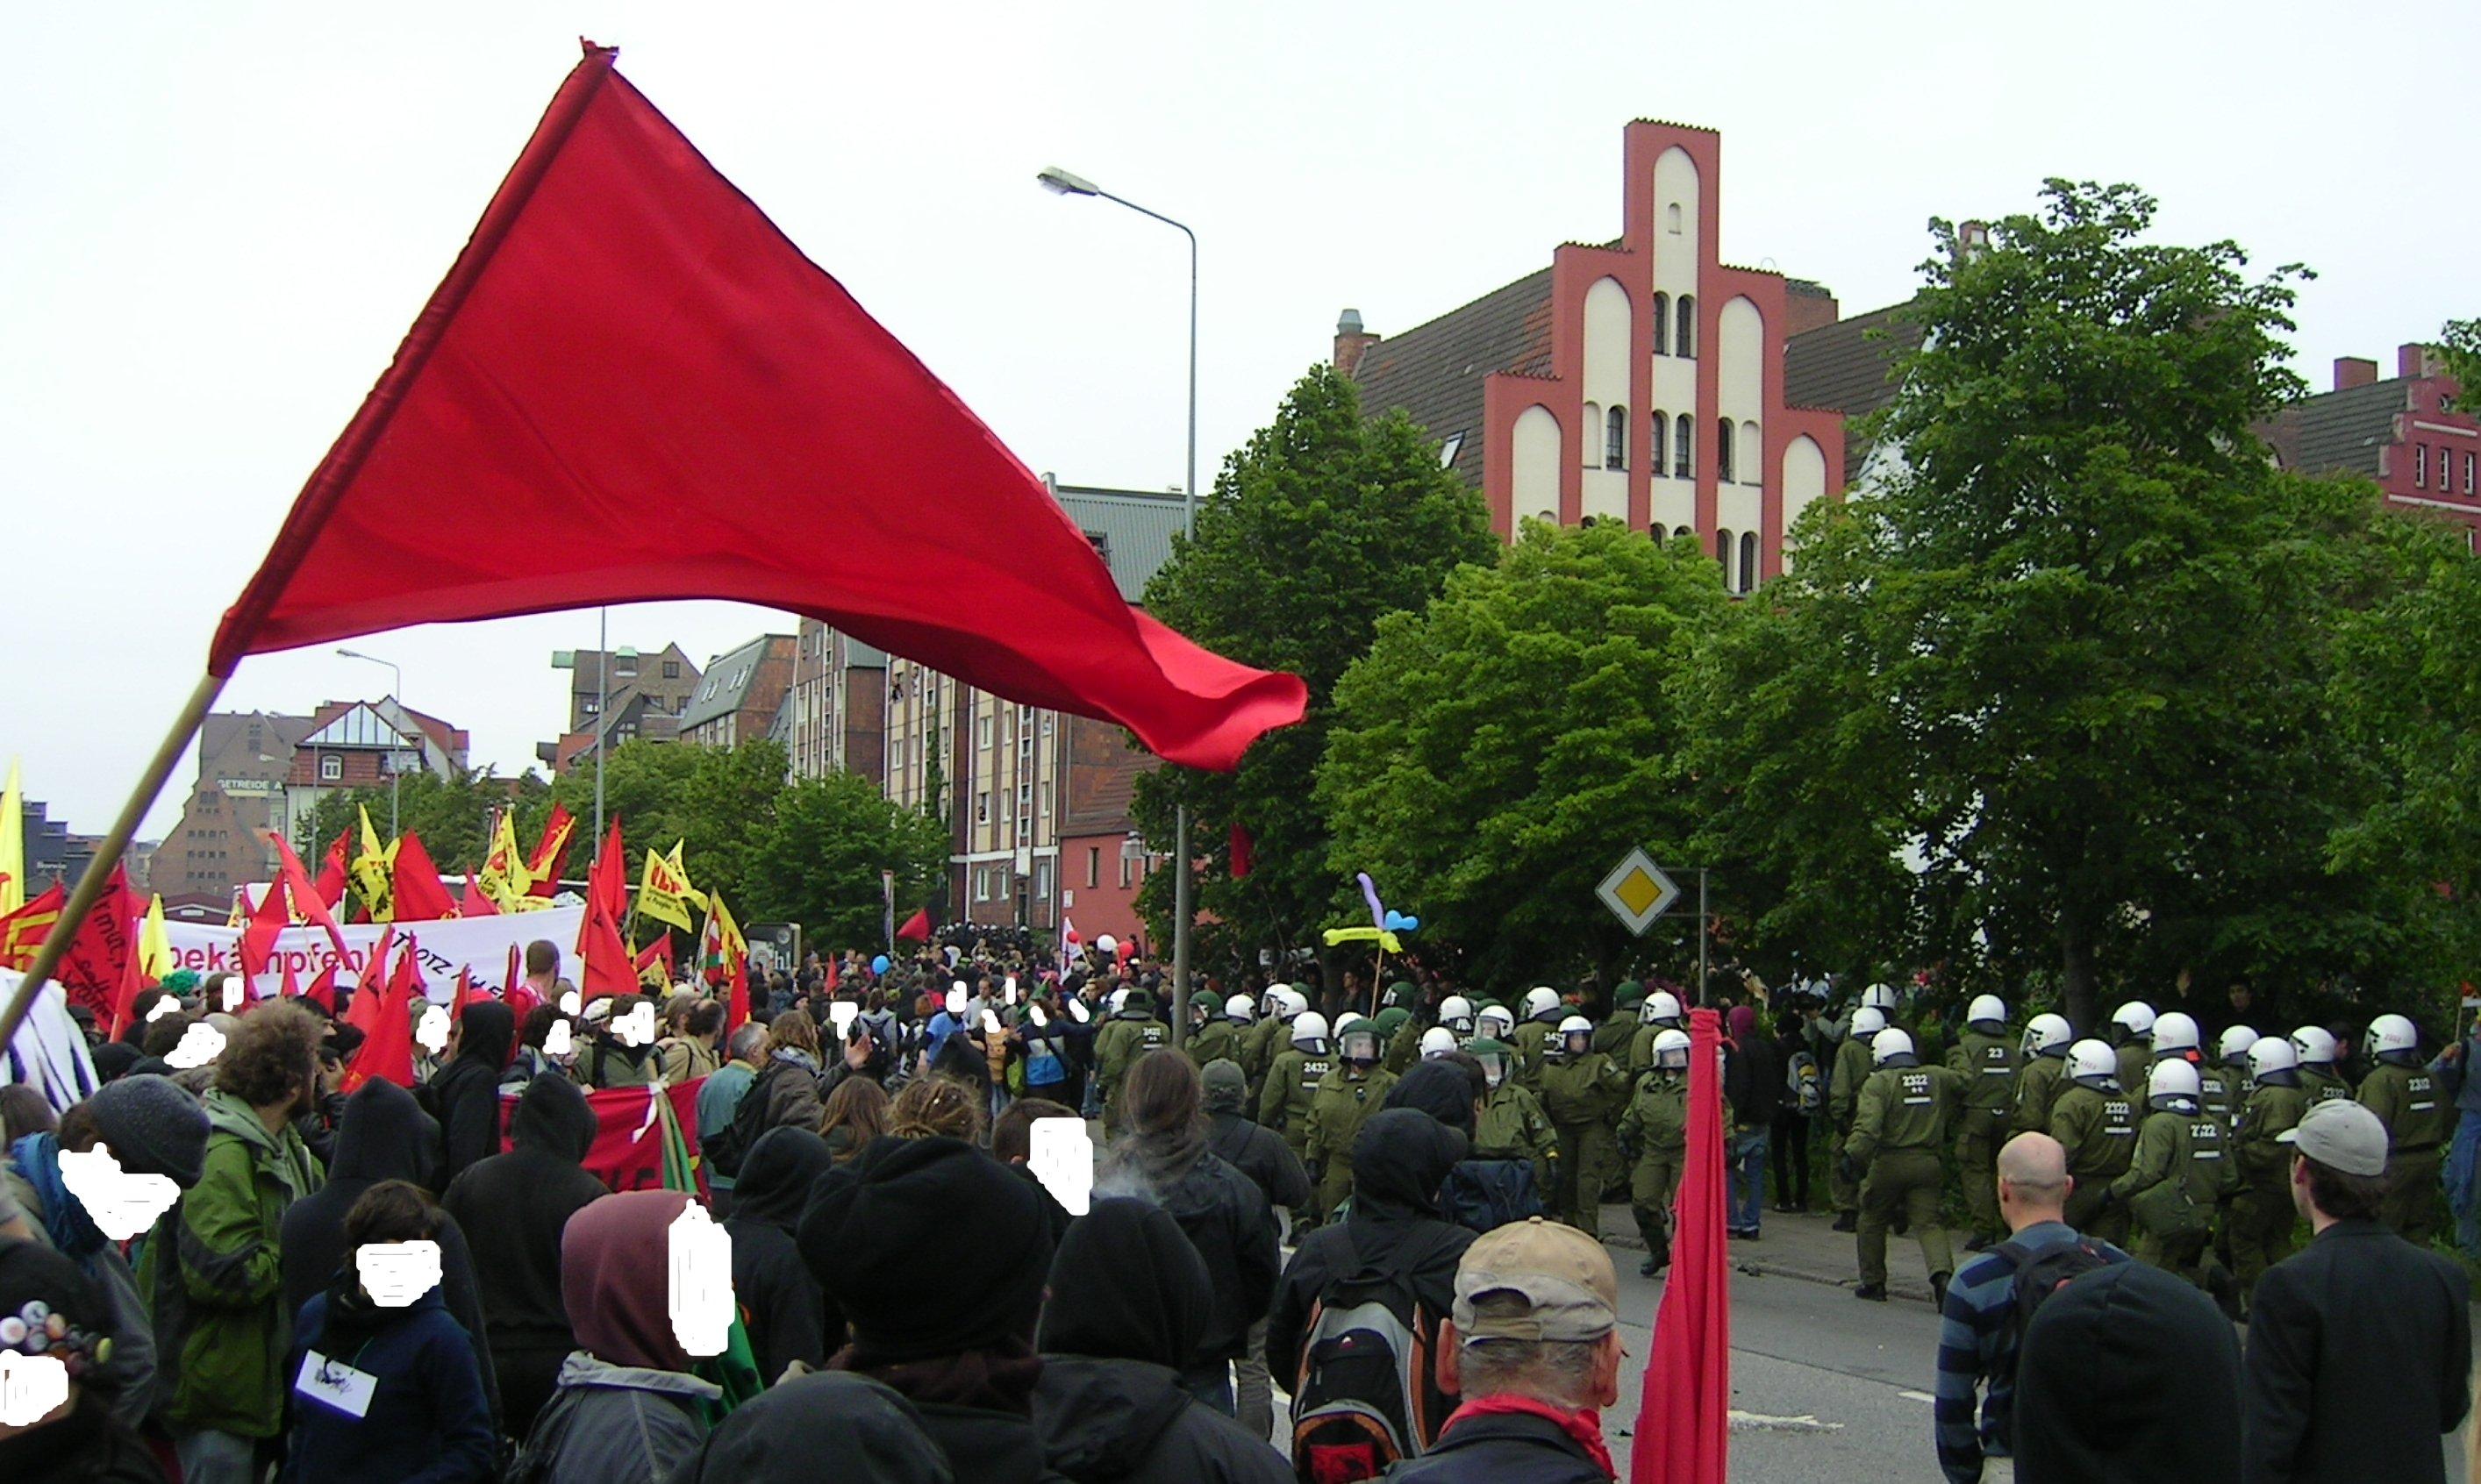 2.6.07 Polizei stürmt in demo rostock